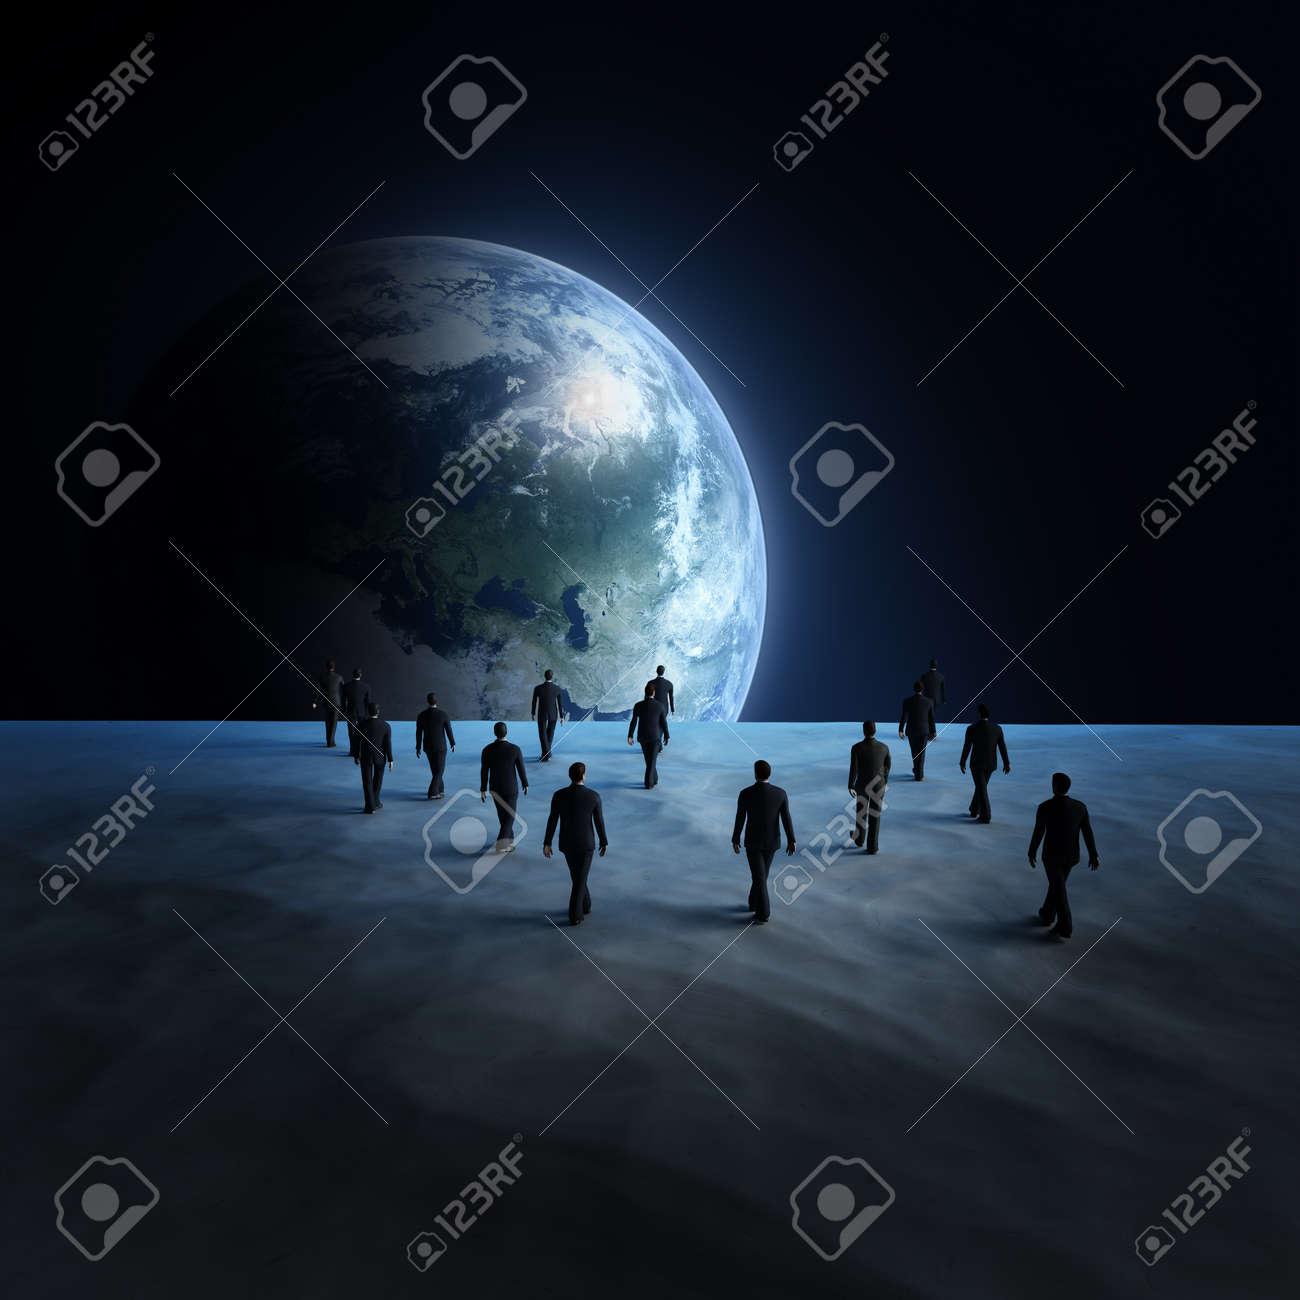 People on the moon Stock Photo - 19492106